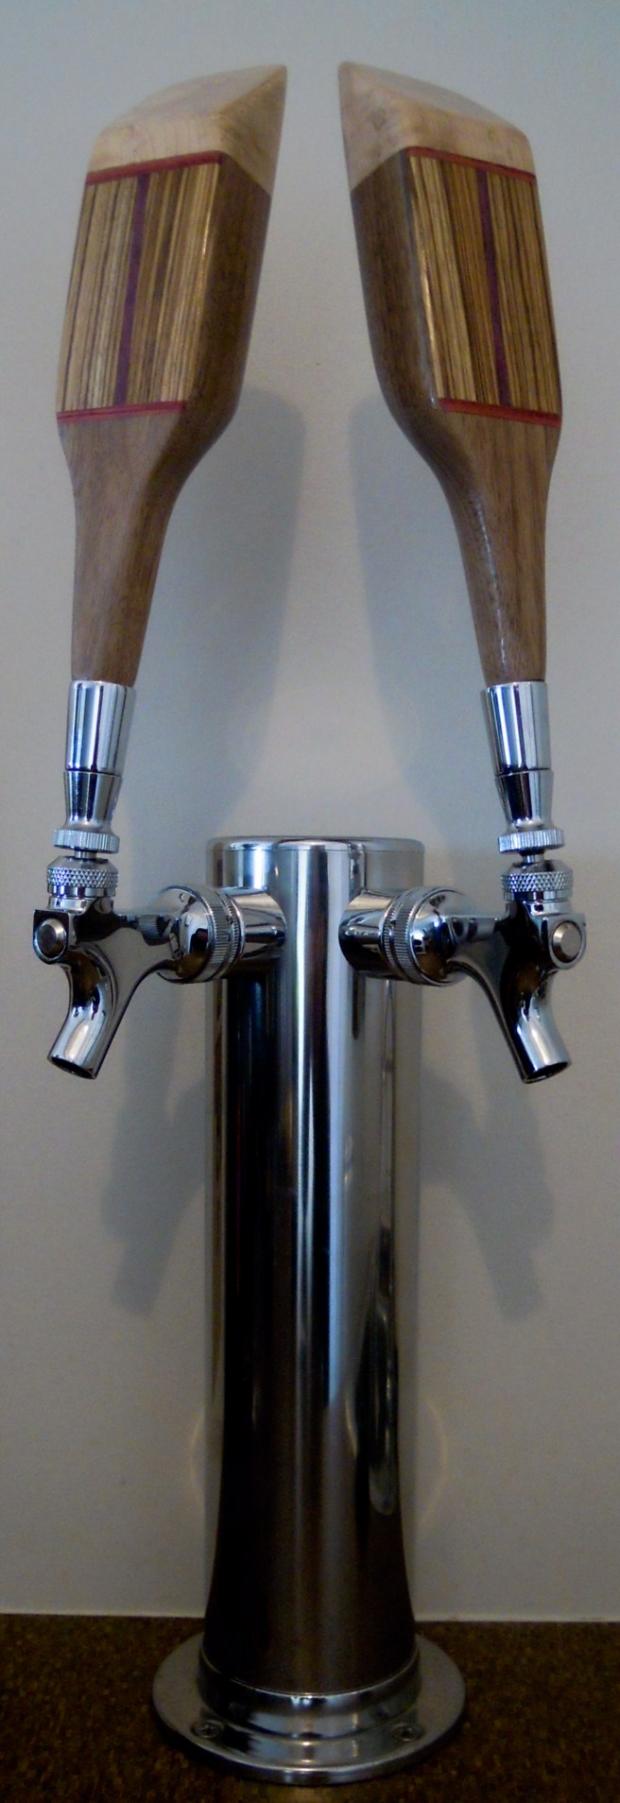 thumb2_tap-handles2-50-58372